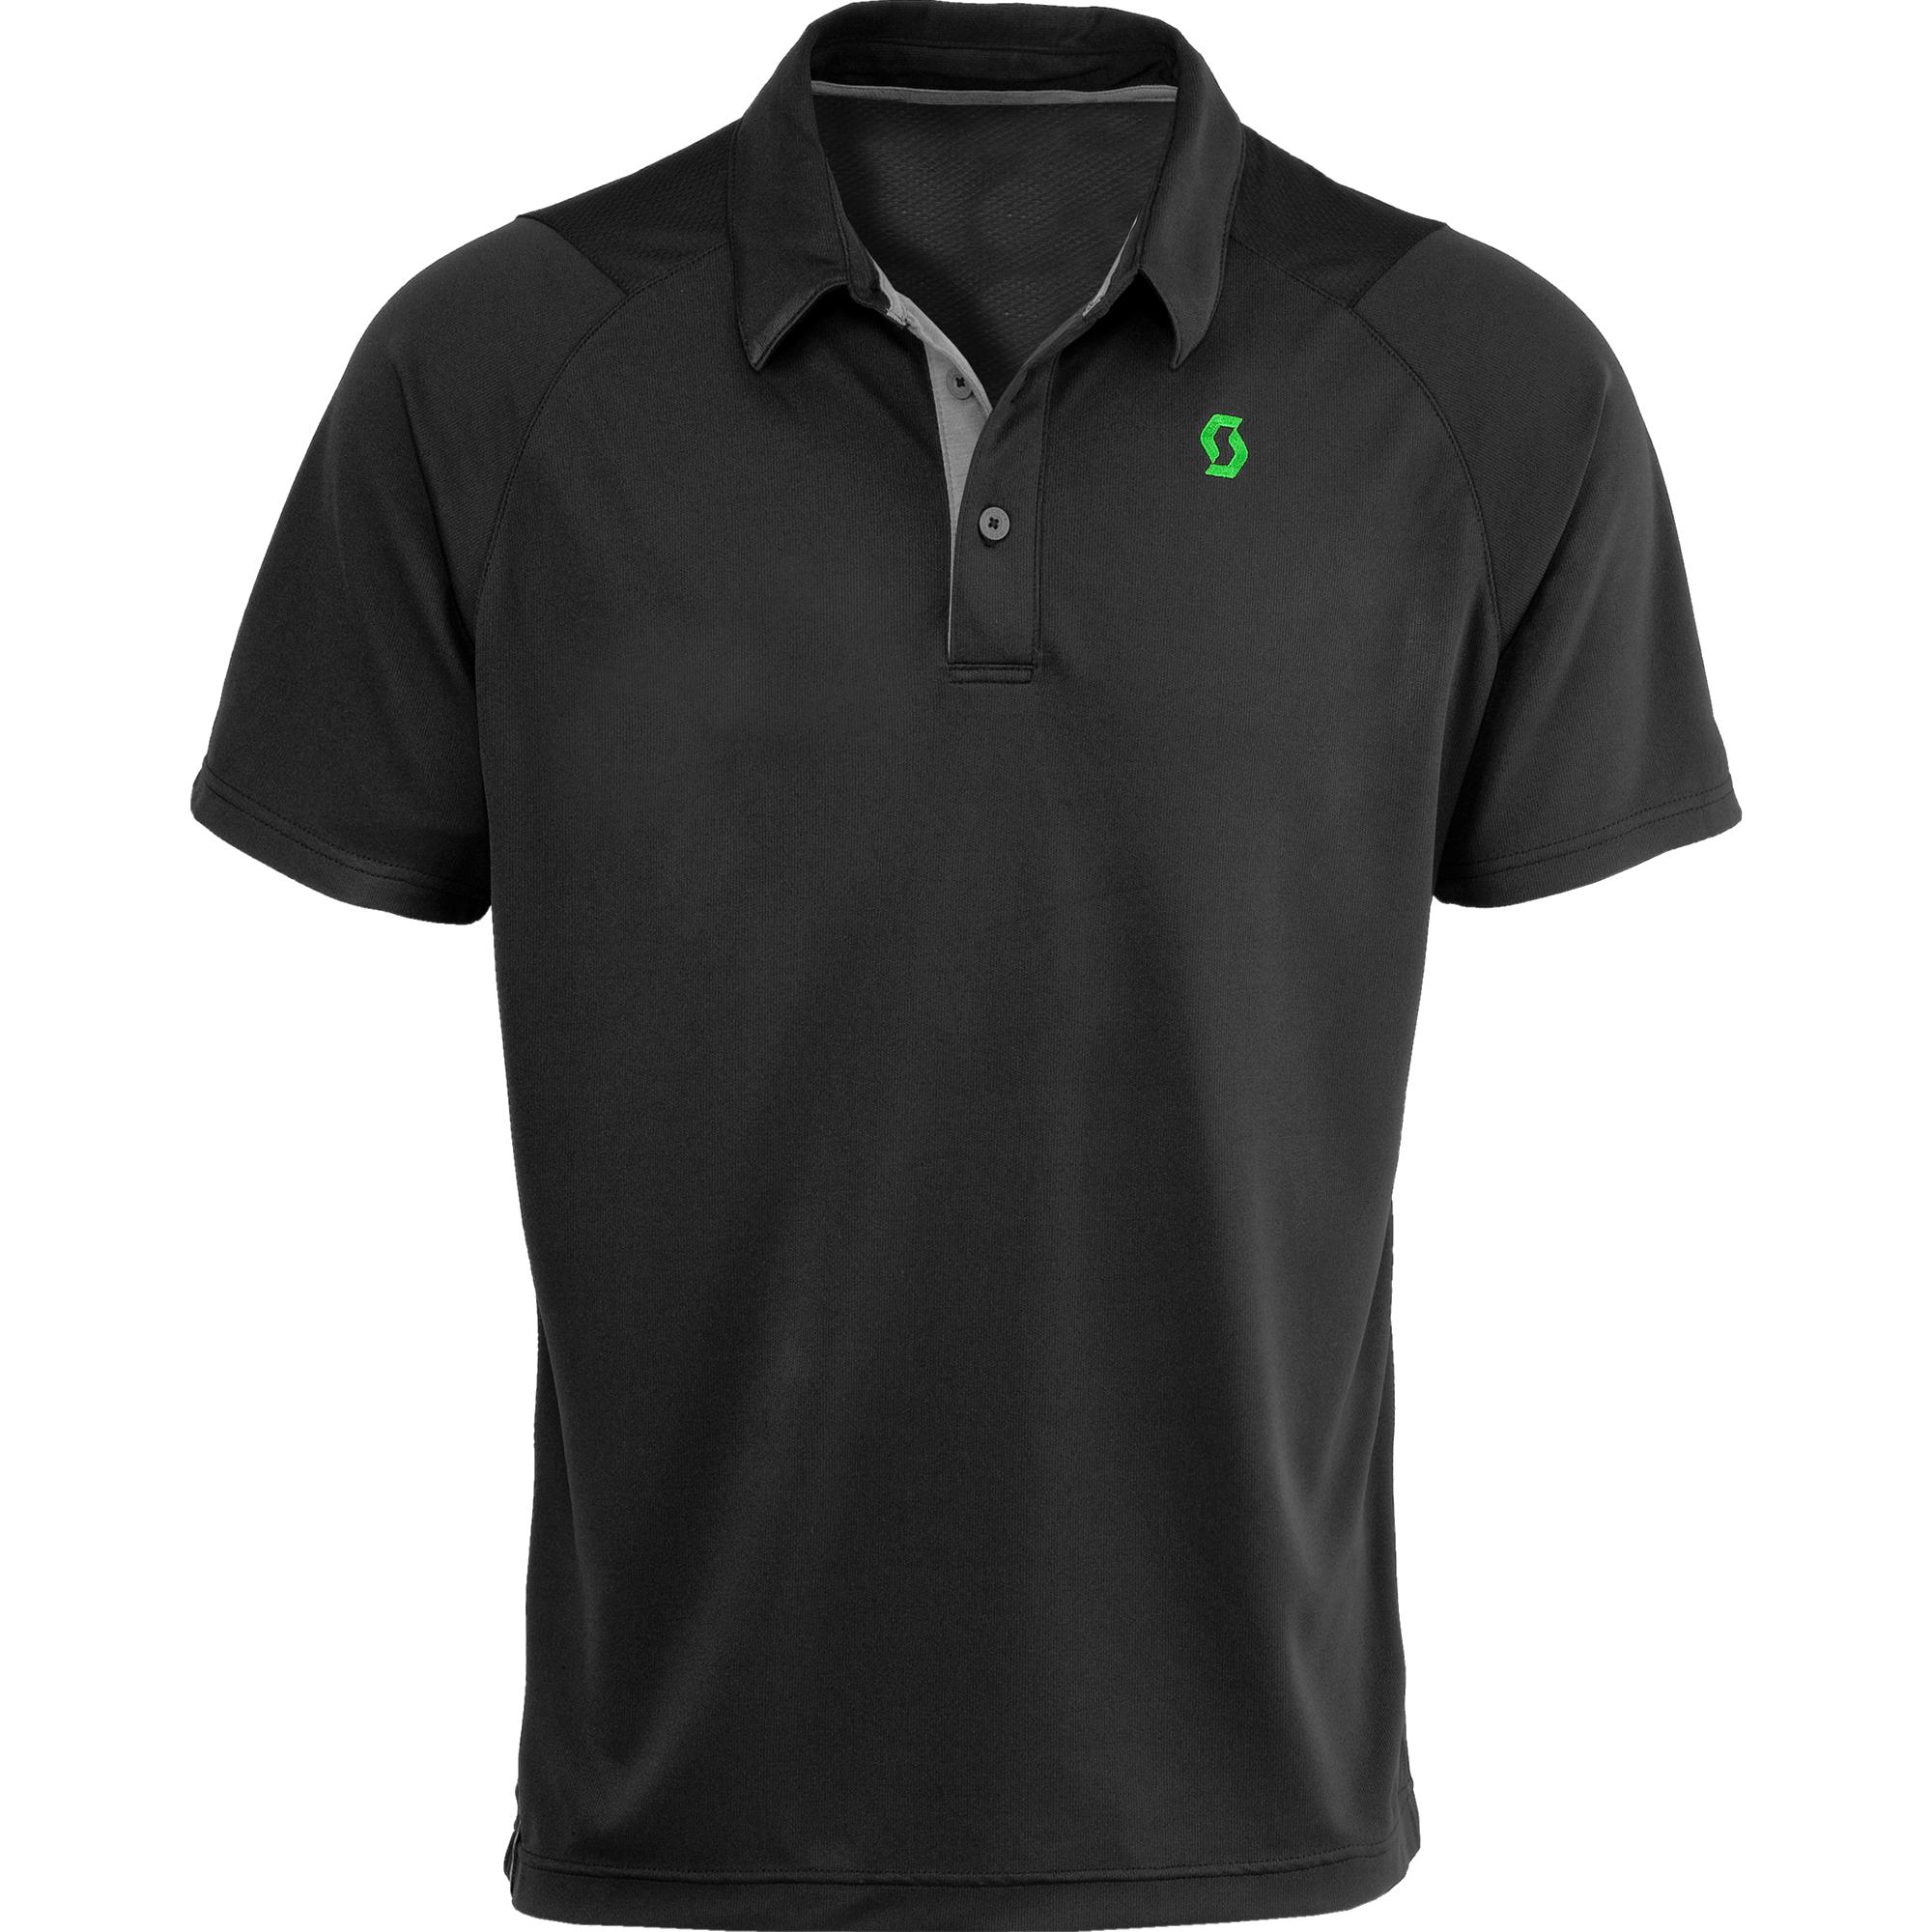 Polo Shirt Png Photos - Polo Shirt, Transparent background PNG HD thumbnail